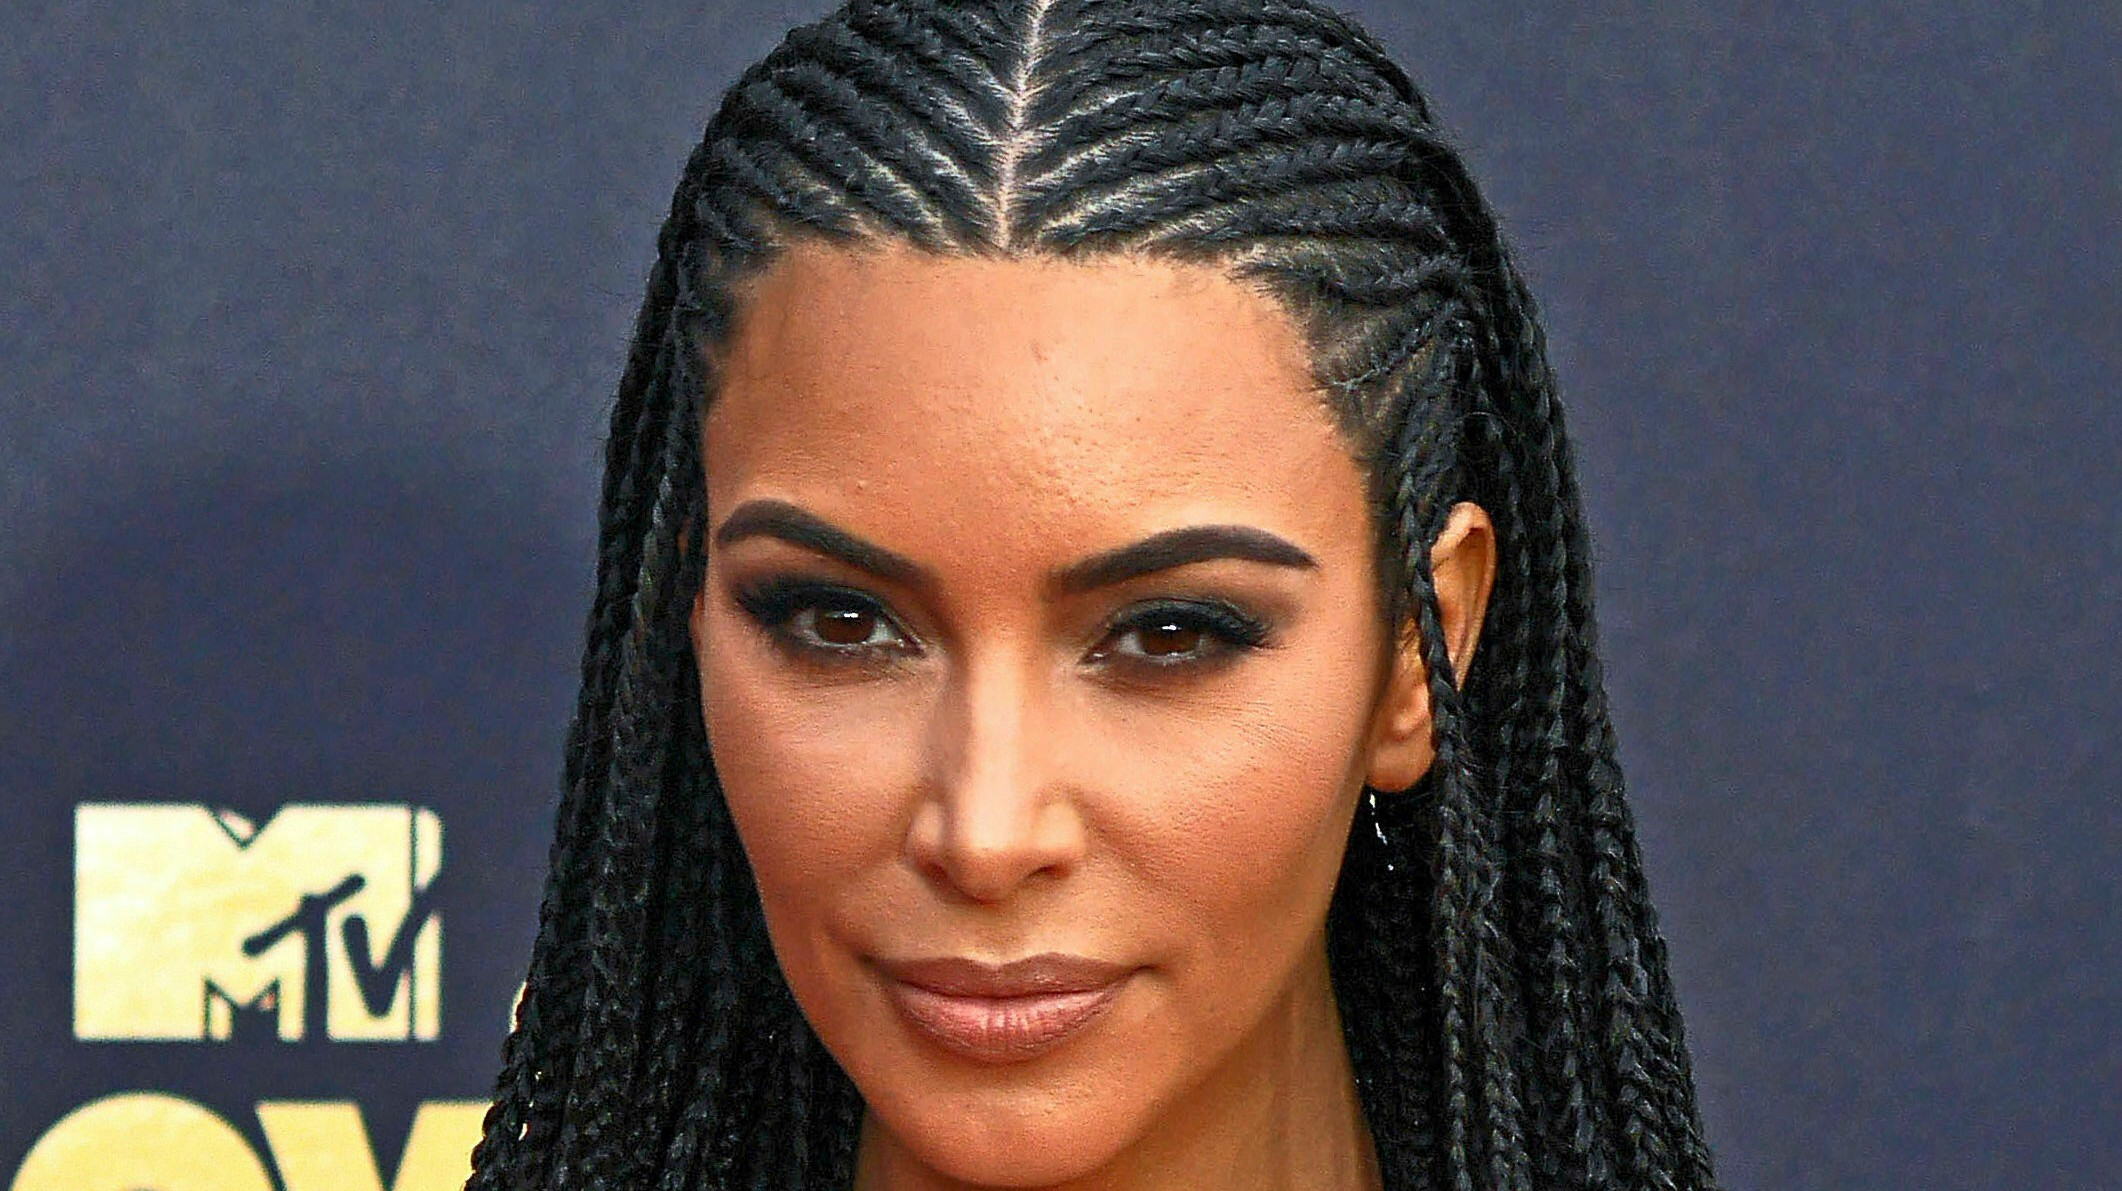 Kim Kardashian's Underwear Line Just Pissed Off All of Japan